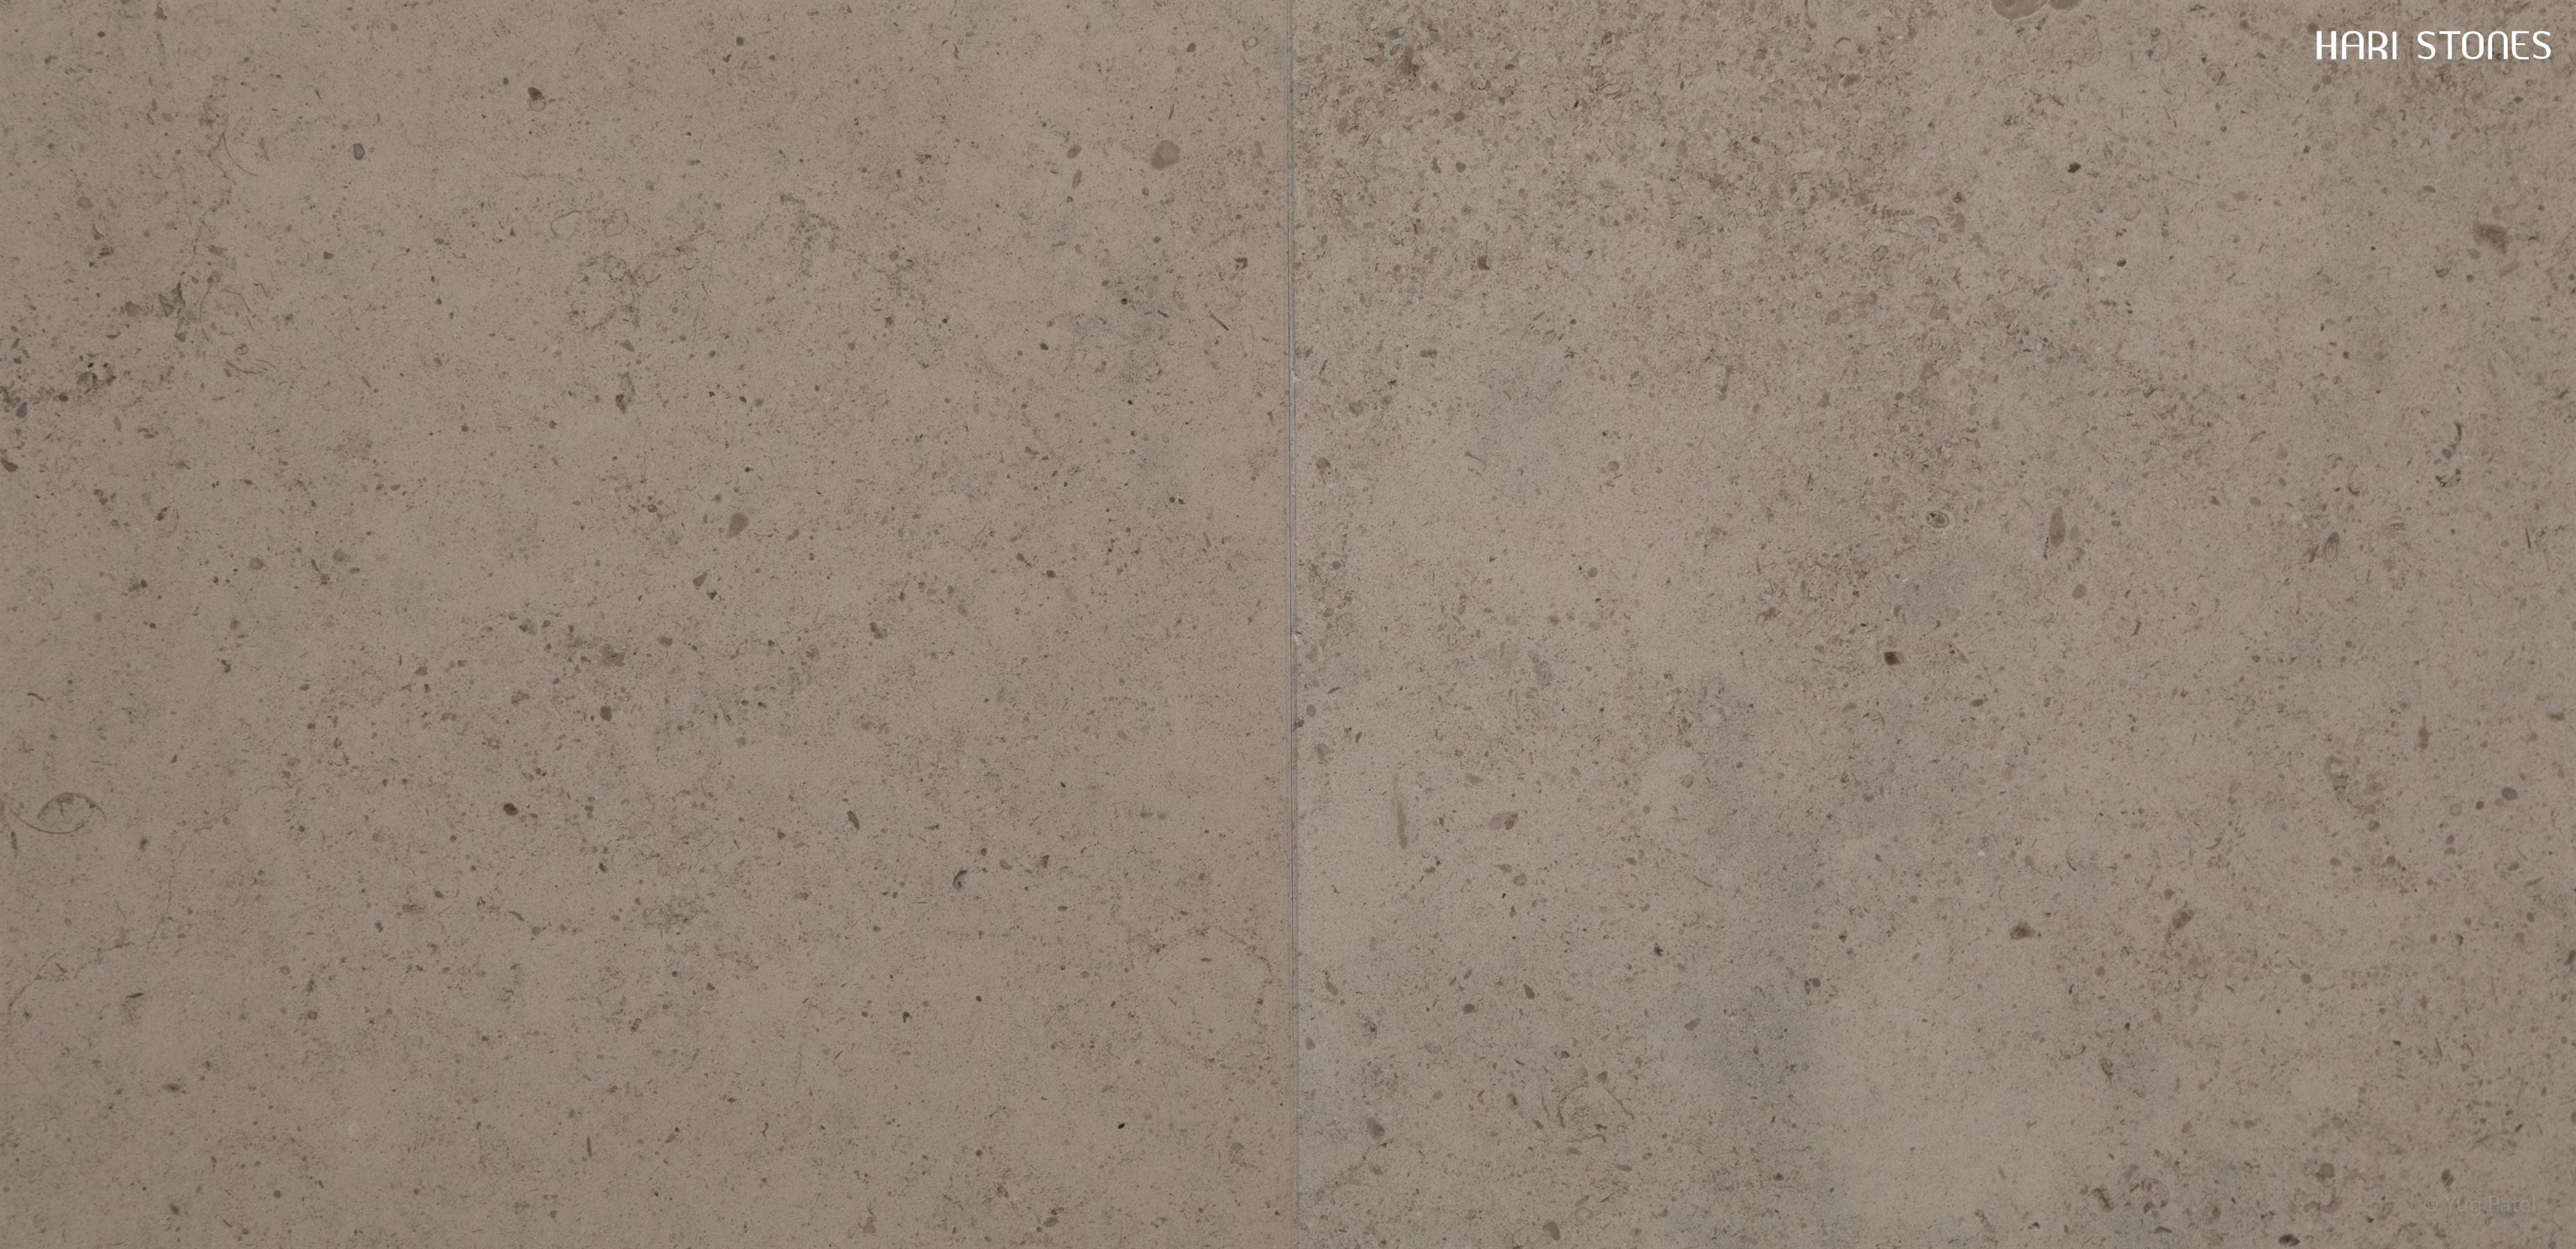 Gascogne Blue Polished Limestones Tiles Suppliers